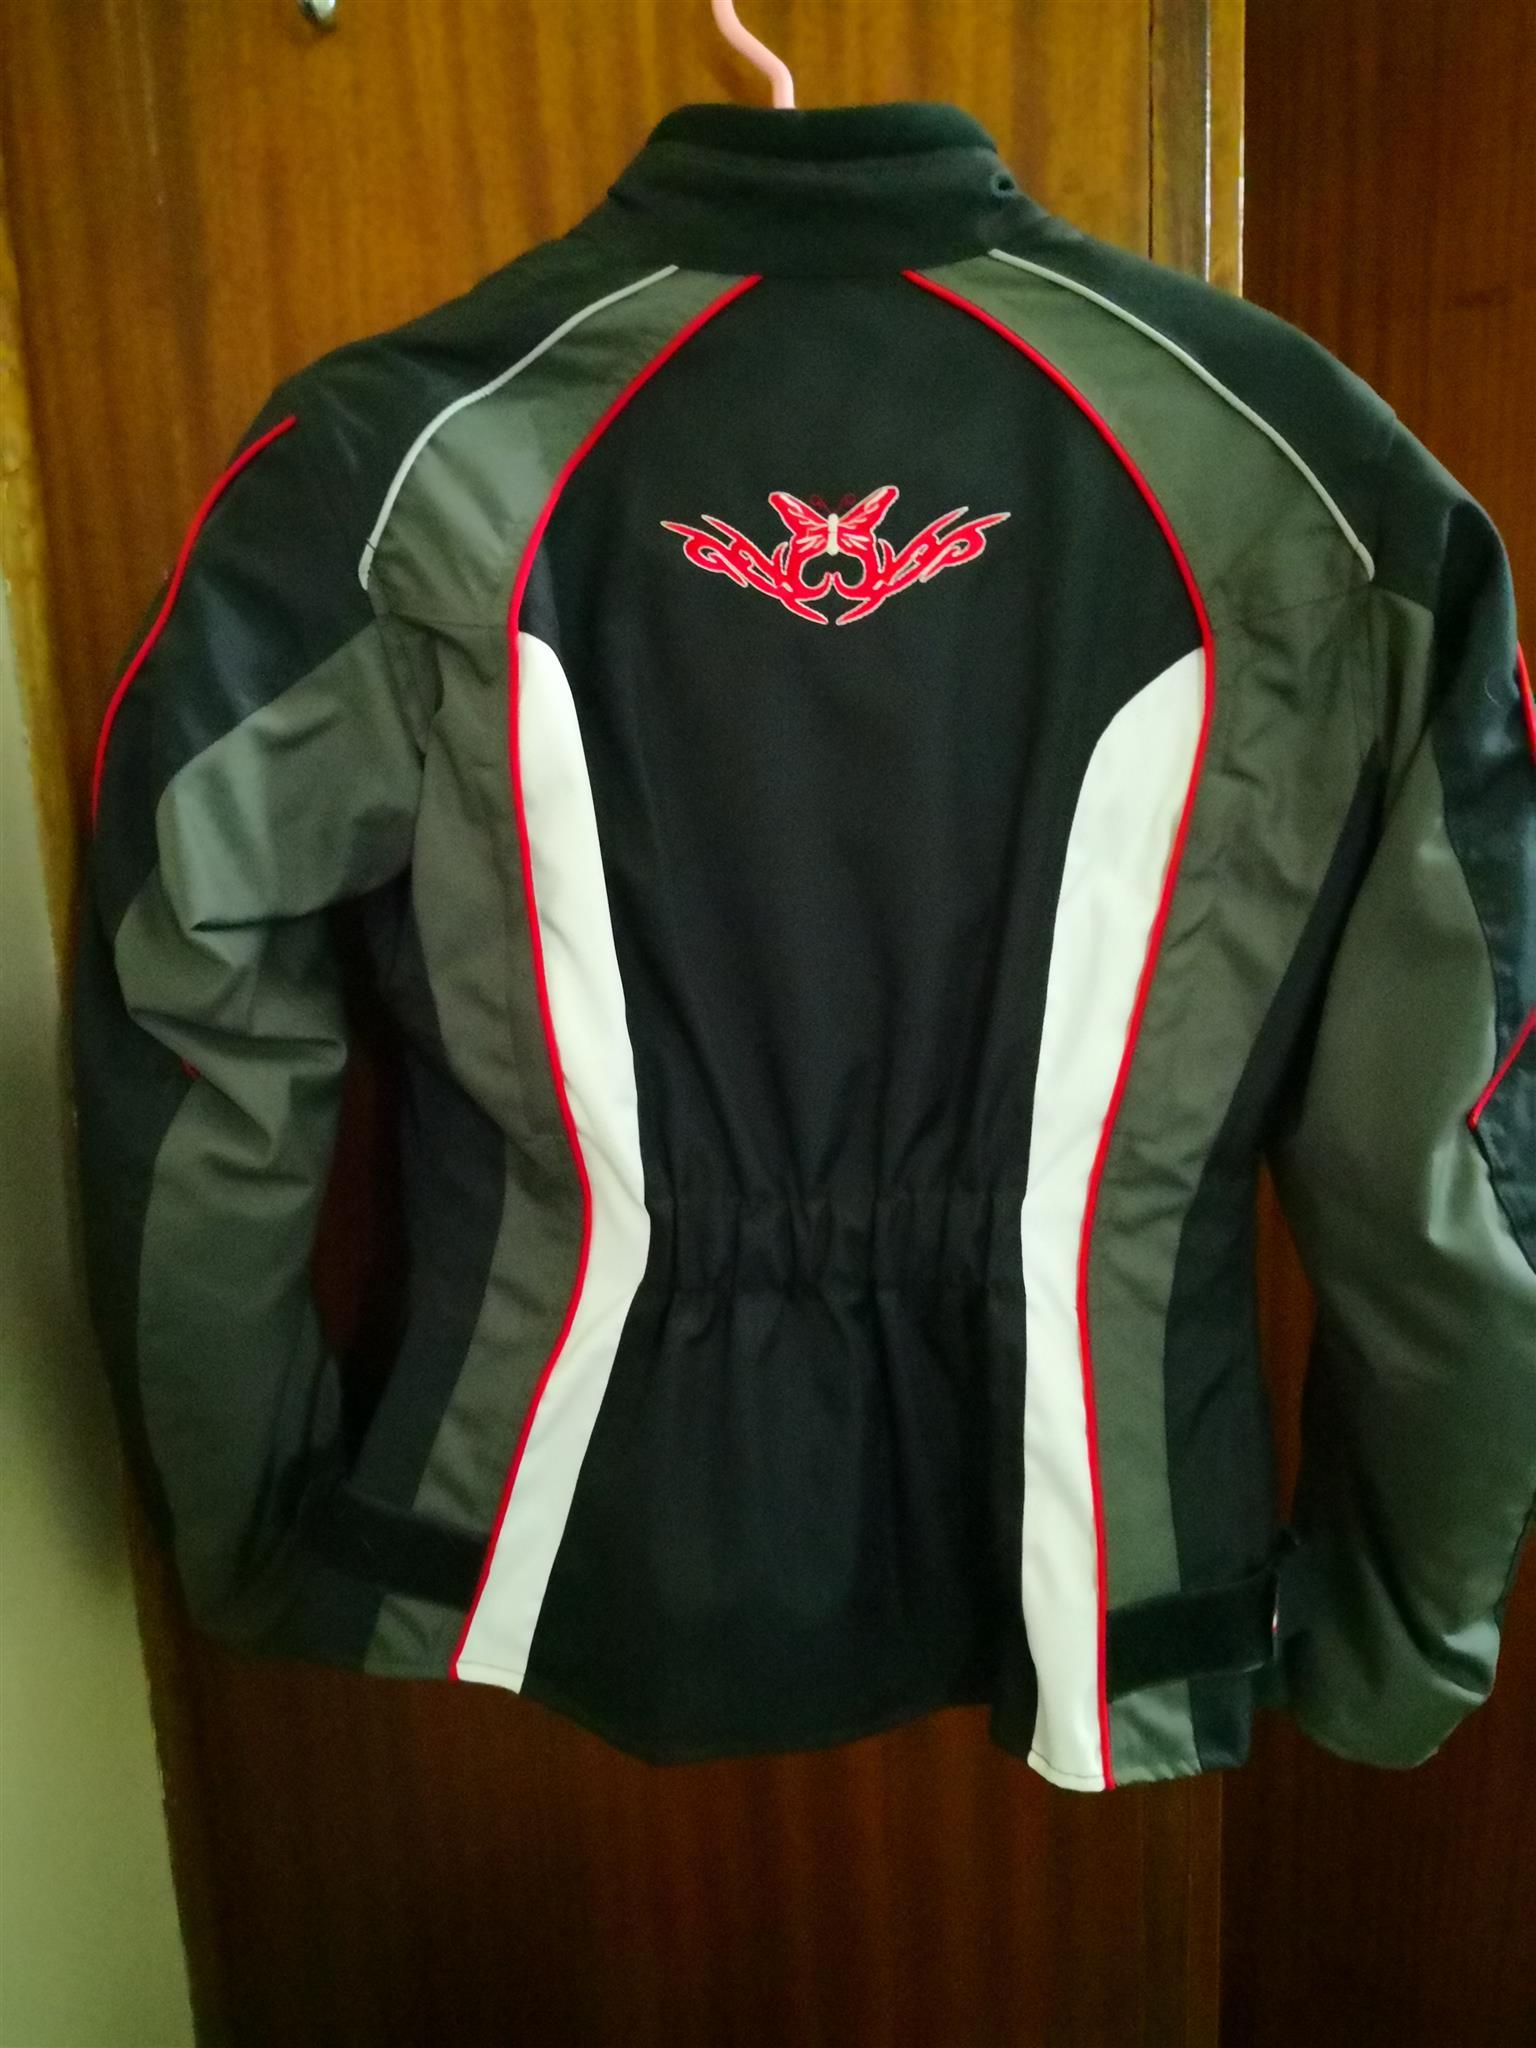 Motorbike jackets and helmet